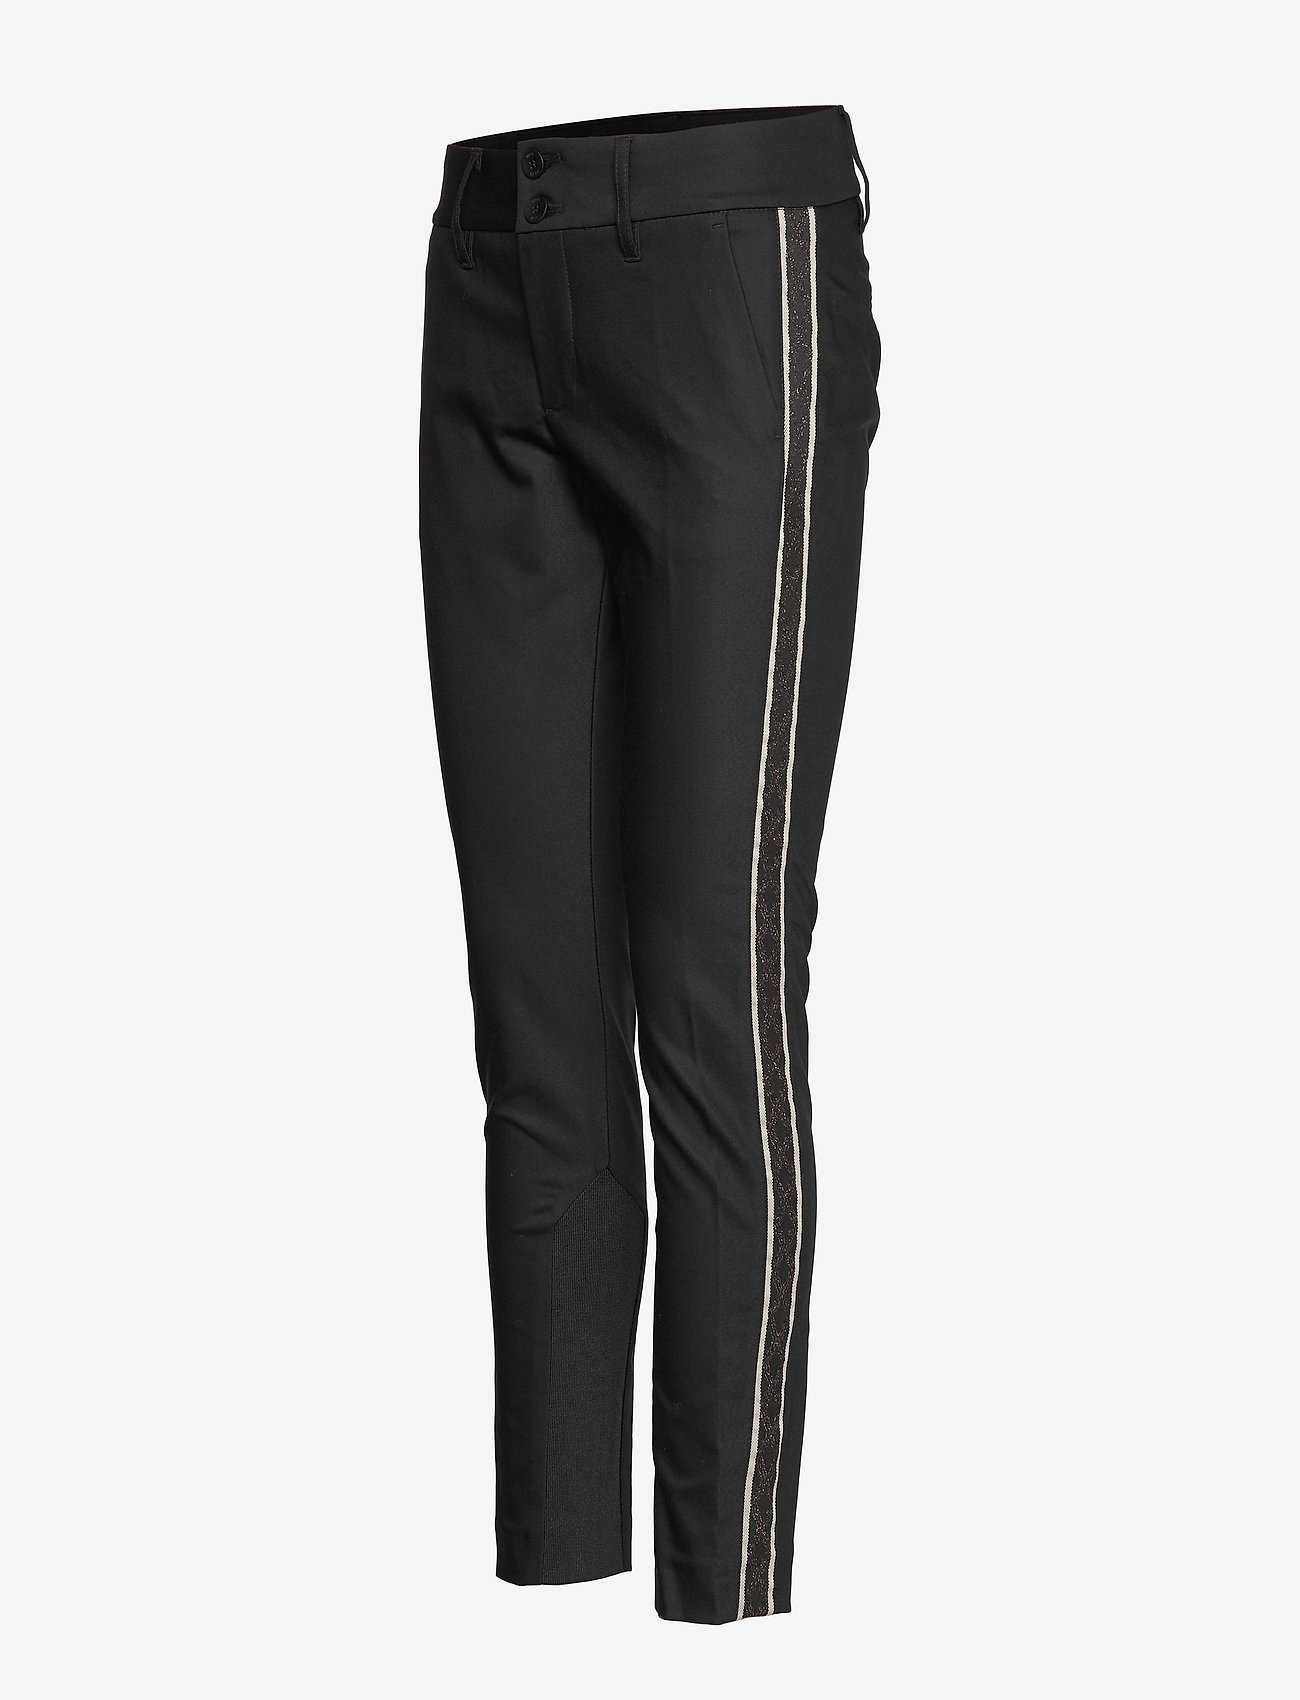 MOS MOSH Blake Rocco Tape Pant - Trousers BLACK